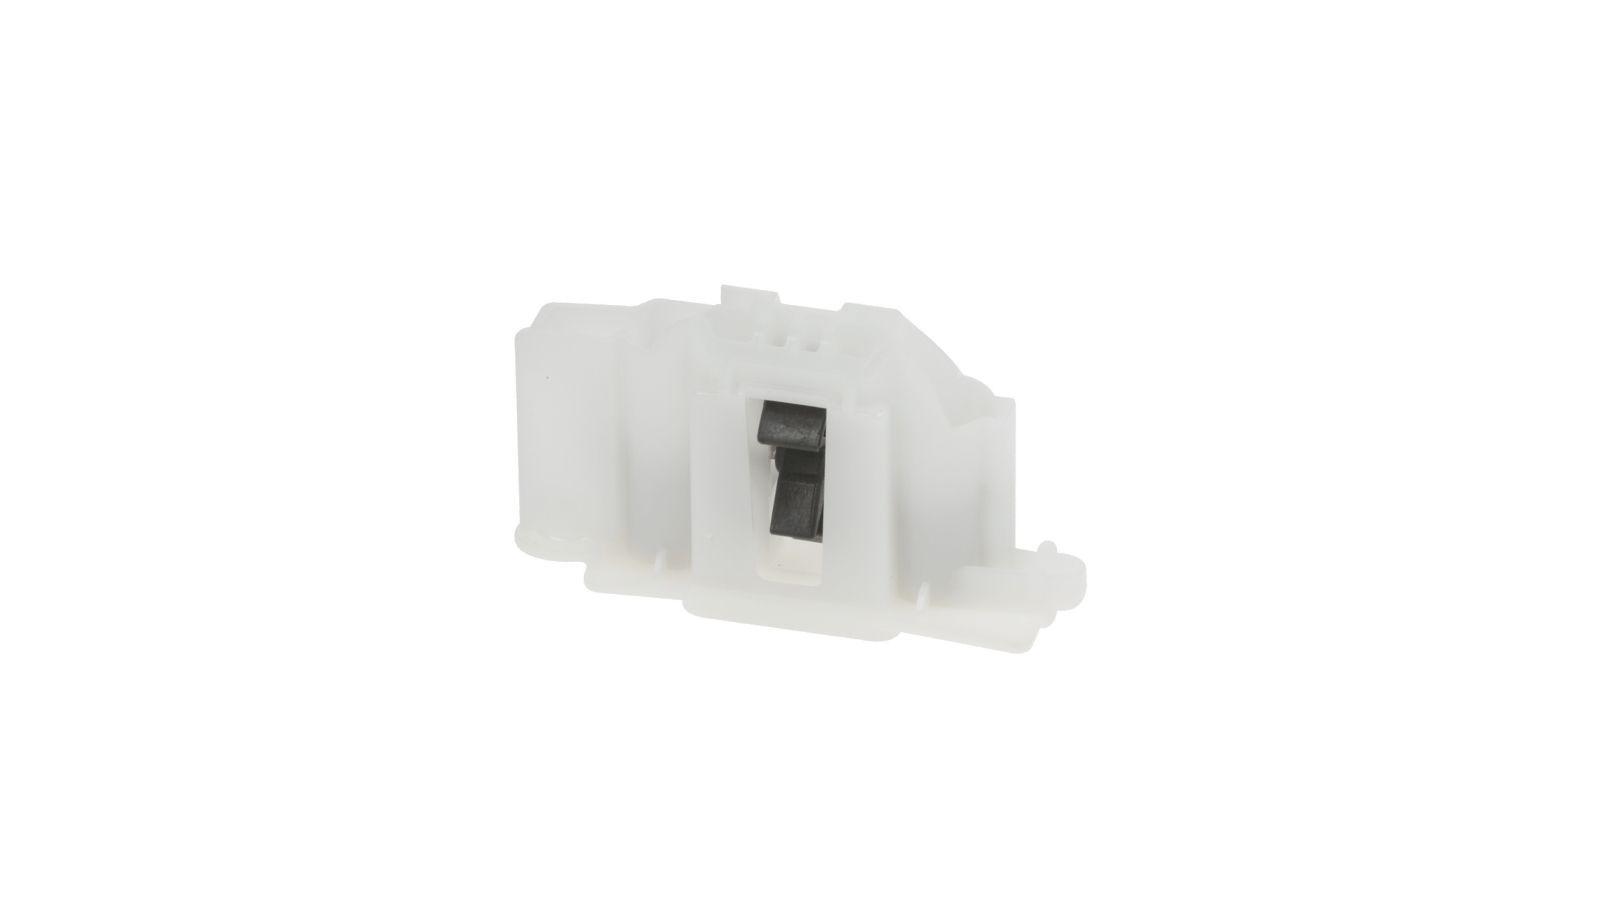 Lock for Bosch Siemens Tumble Dryers BSH